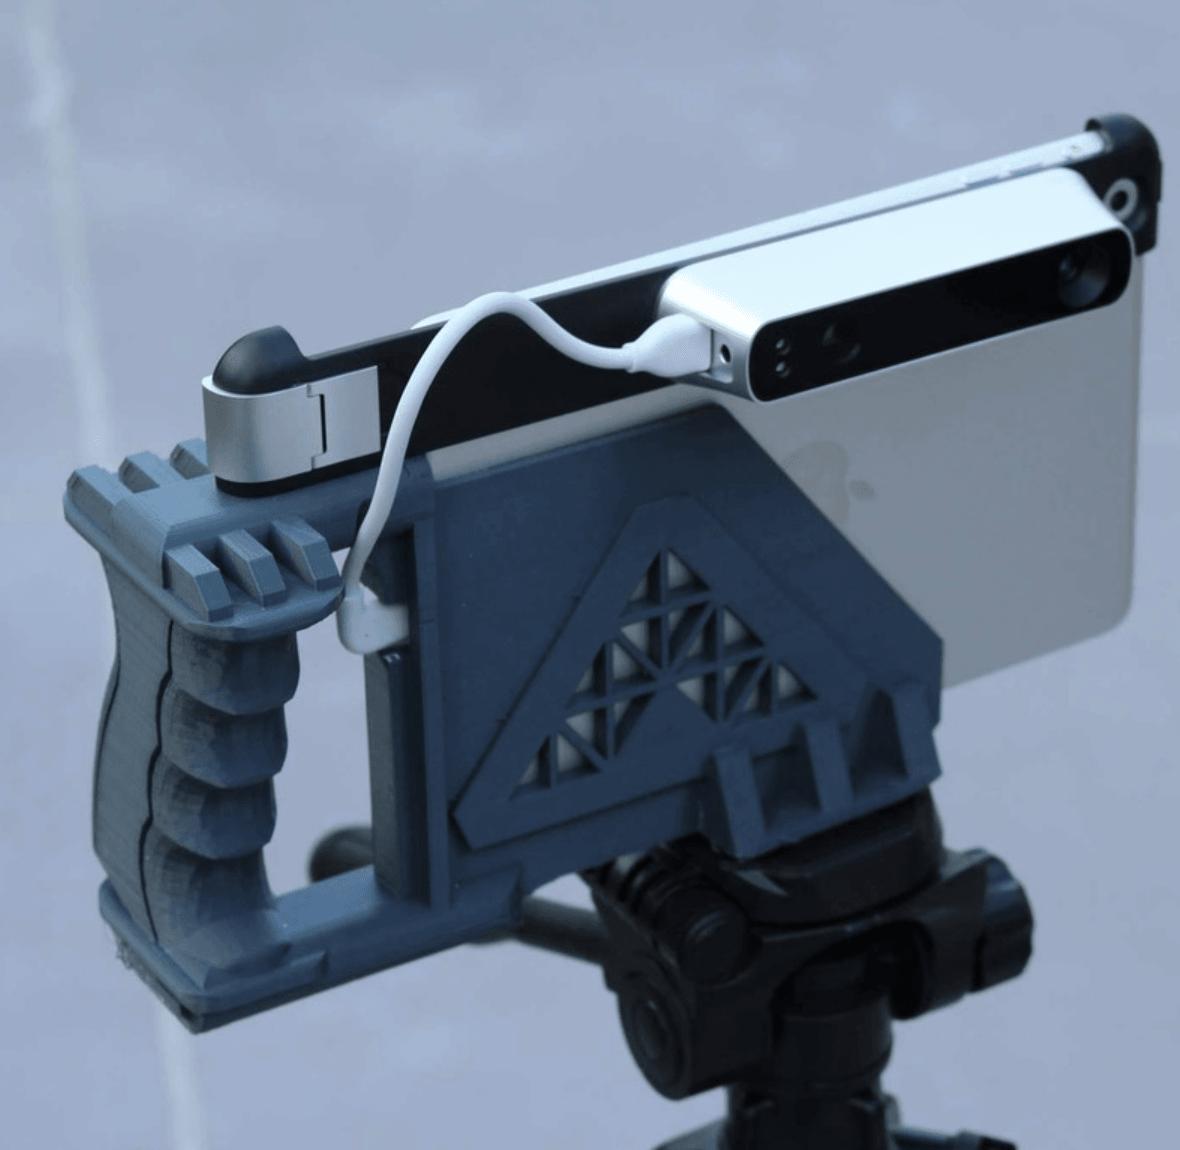 Capture d'écran 2018-04-09 à 15.02.26.png Download free STL file Structure Sensor Tripod/Handle Mount • Object to 3D print, DragonflyFabrication